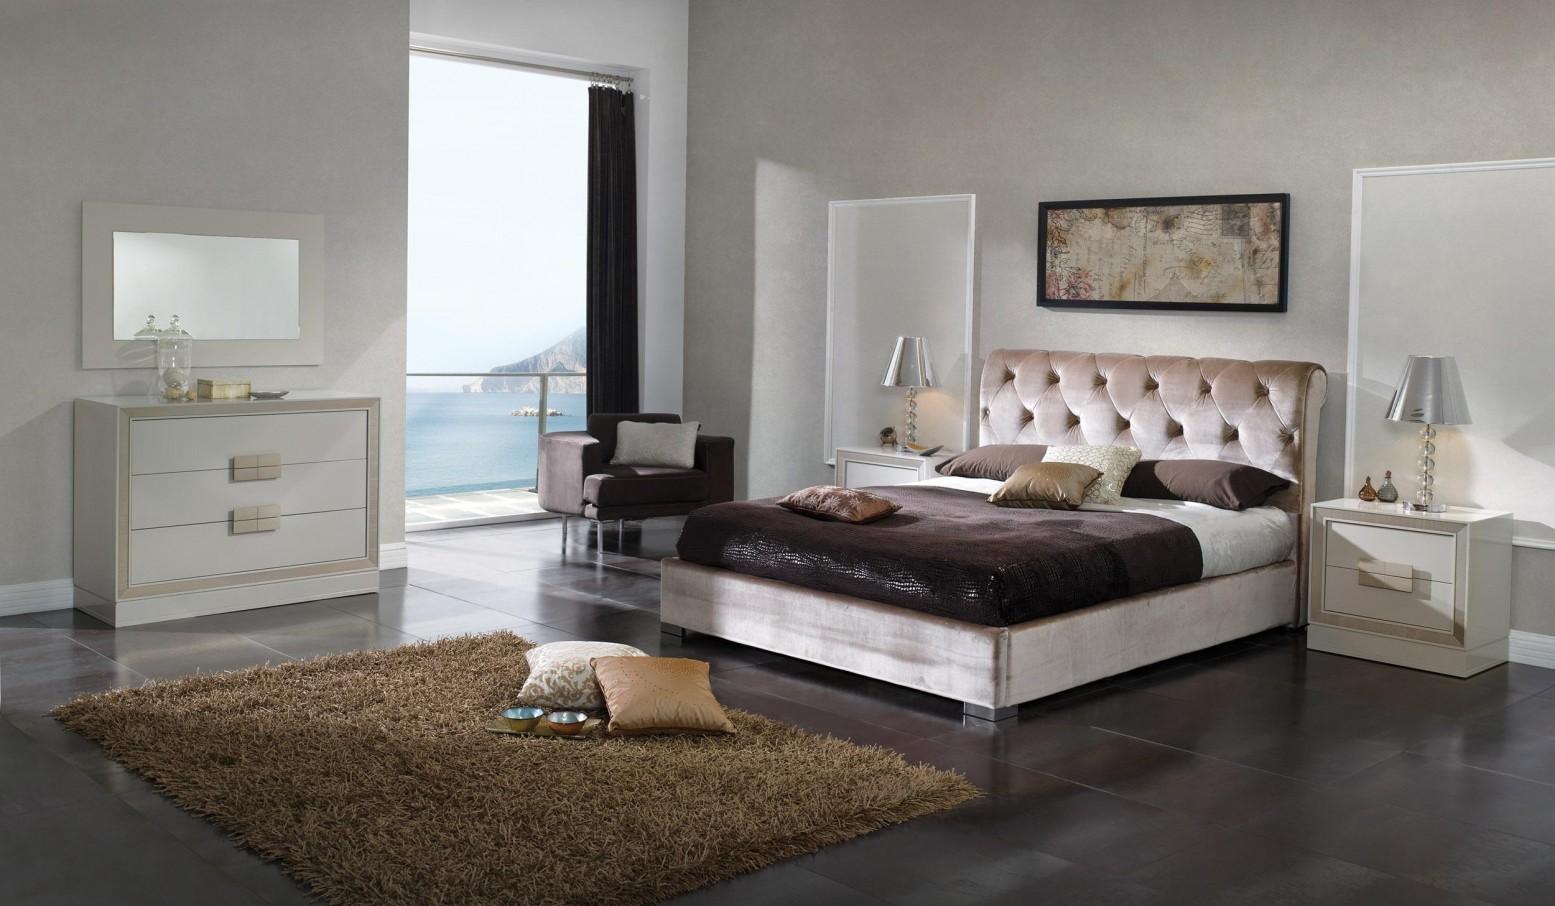 Miriam 3-Piece Queen Size Storage Bedroom Set by Dupen Furniture, Spain